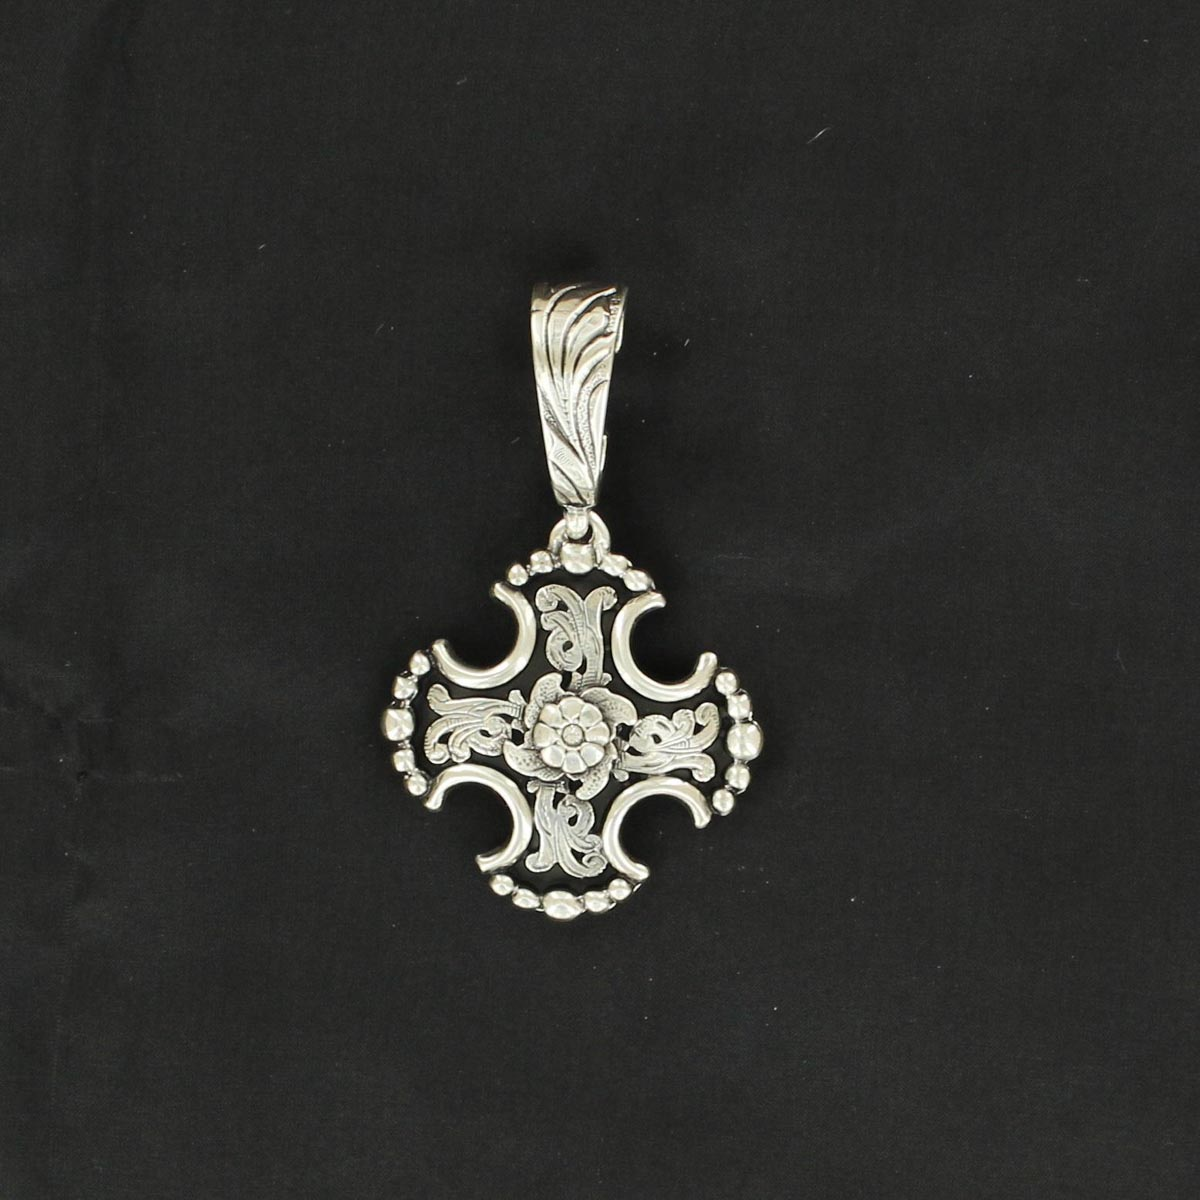 Western Charm Floral Maltese Cross Pendant